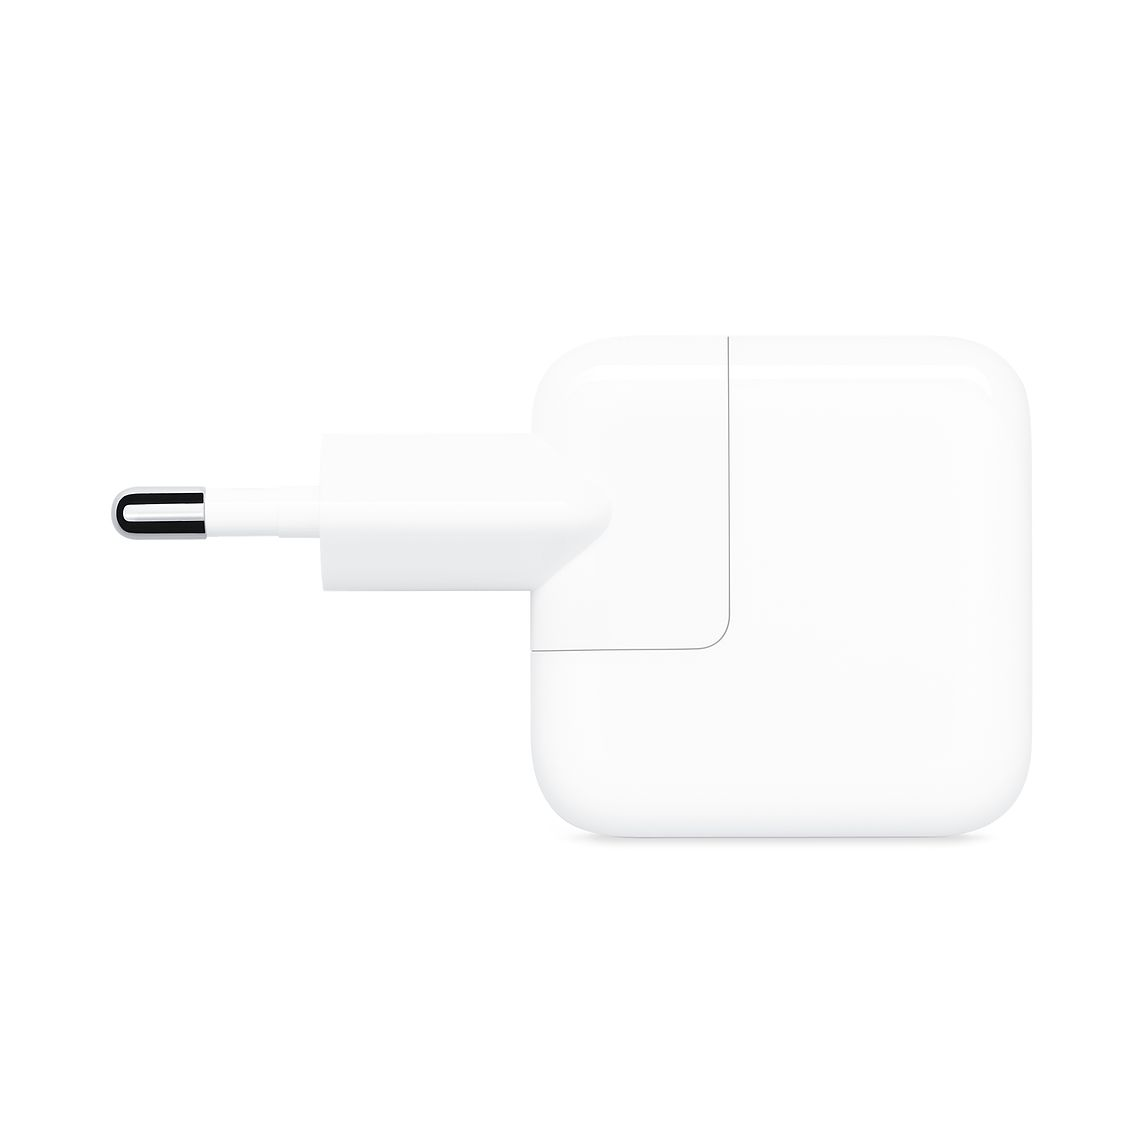 Apple 정품 2020년 12W USB Power 충전기 Adapter MGN03KH/A, 혼합색상, 1개